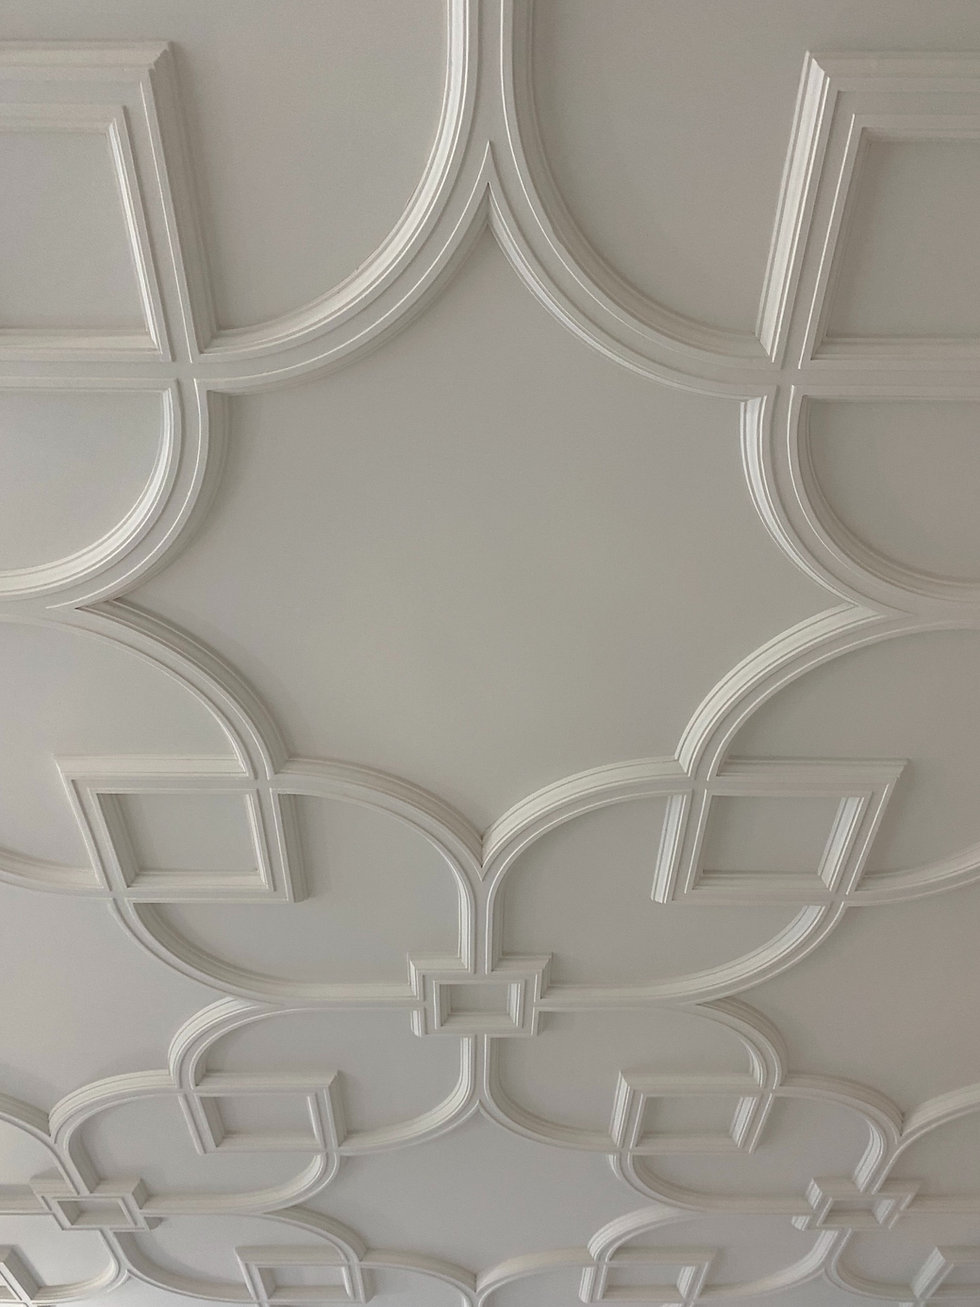 Cornice London Bespoke Fibrous plasterwork gallery